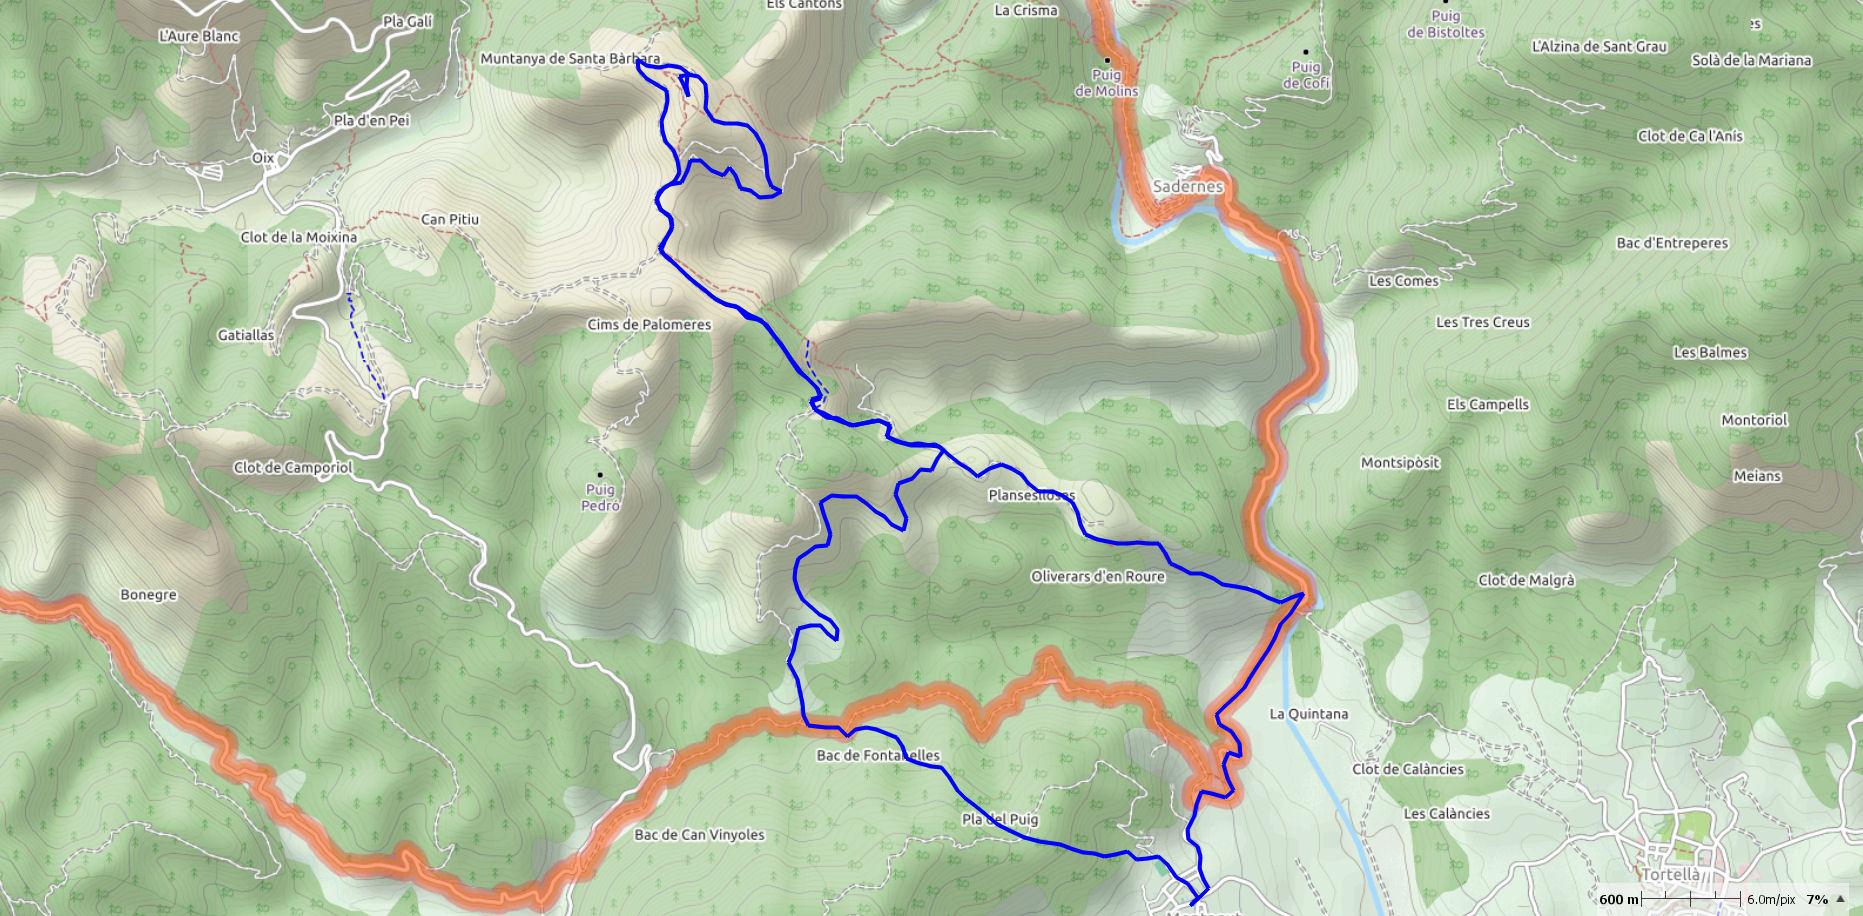 MONTAGUT-BARBARA-MAP